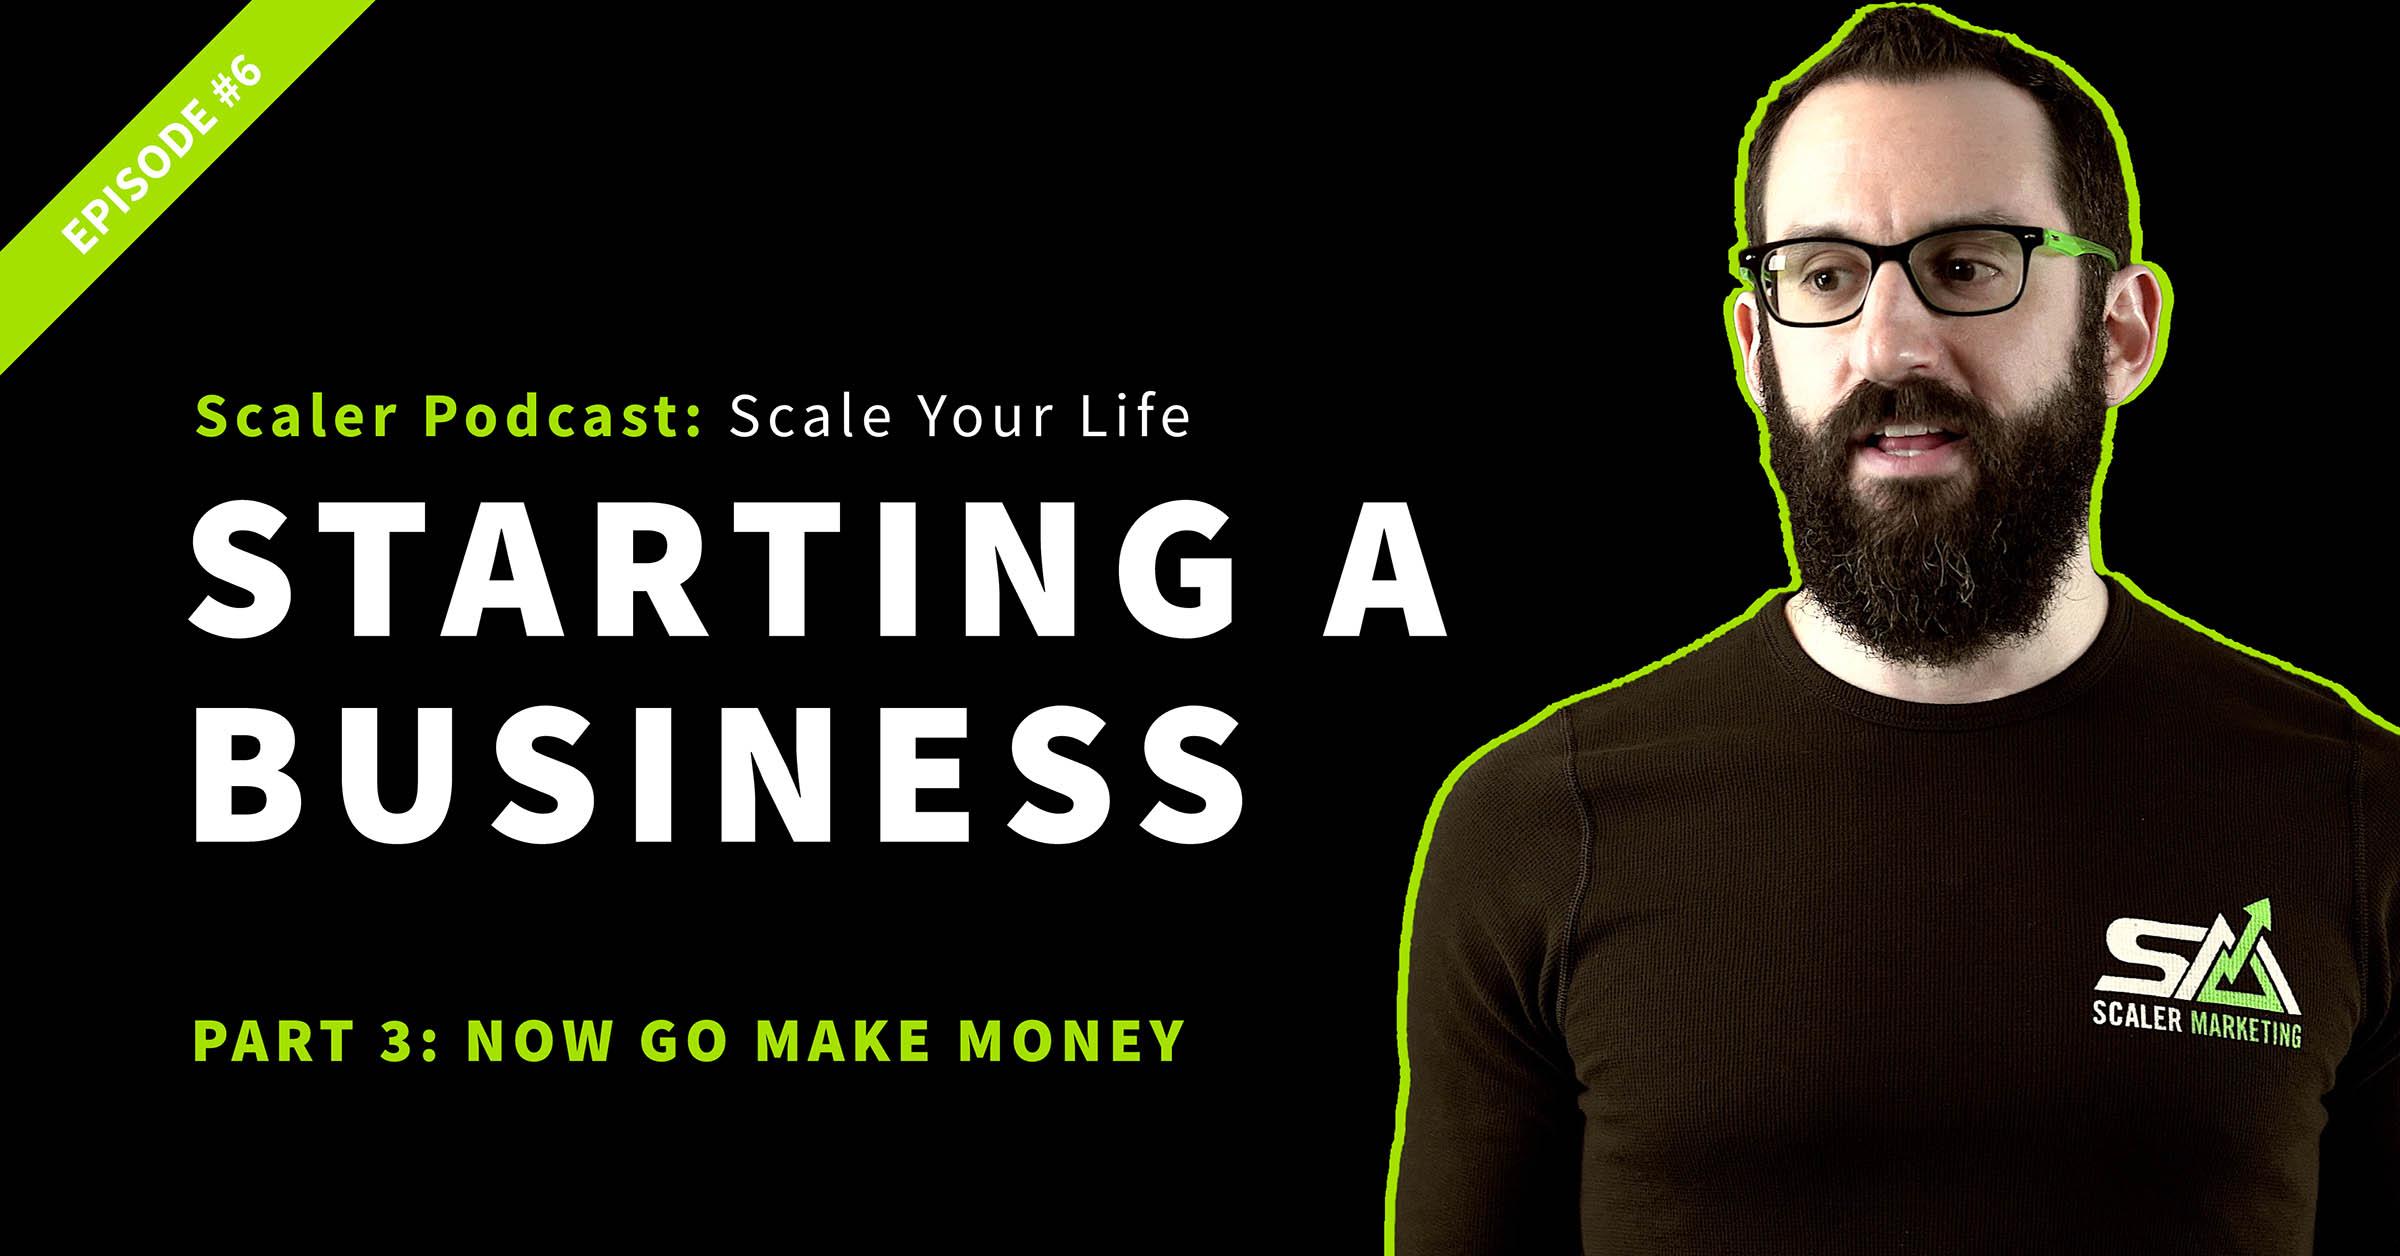 Episode 6 - Starting A Business Pt. 3 - Now Go Make Money